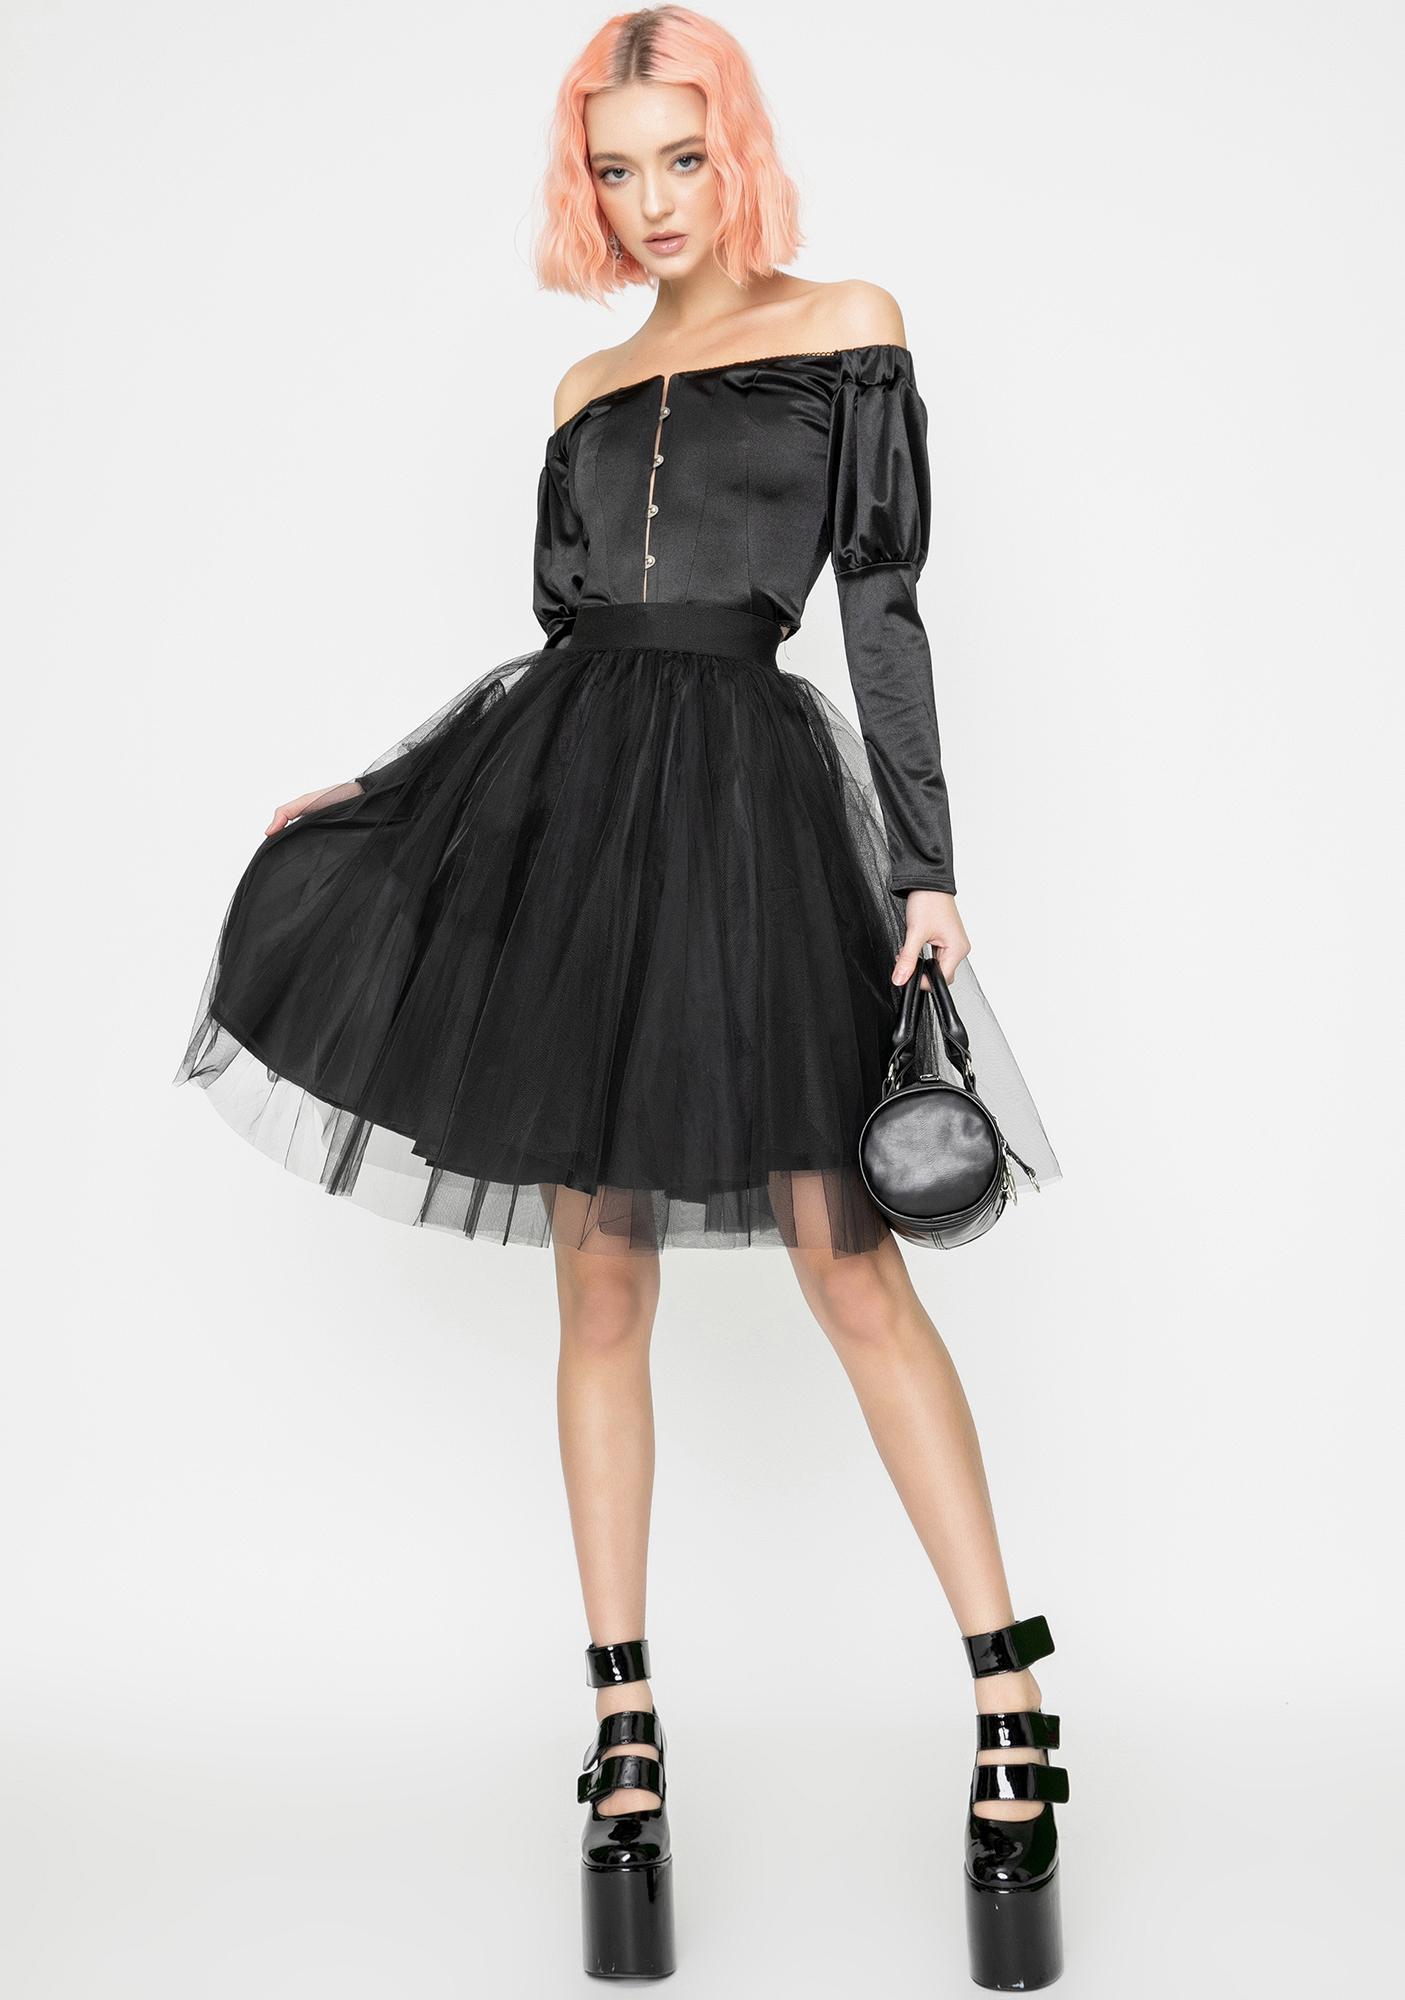 Kiki Riki Haunted Royalty Tutu Skirt